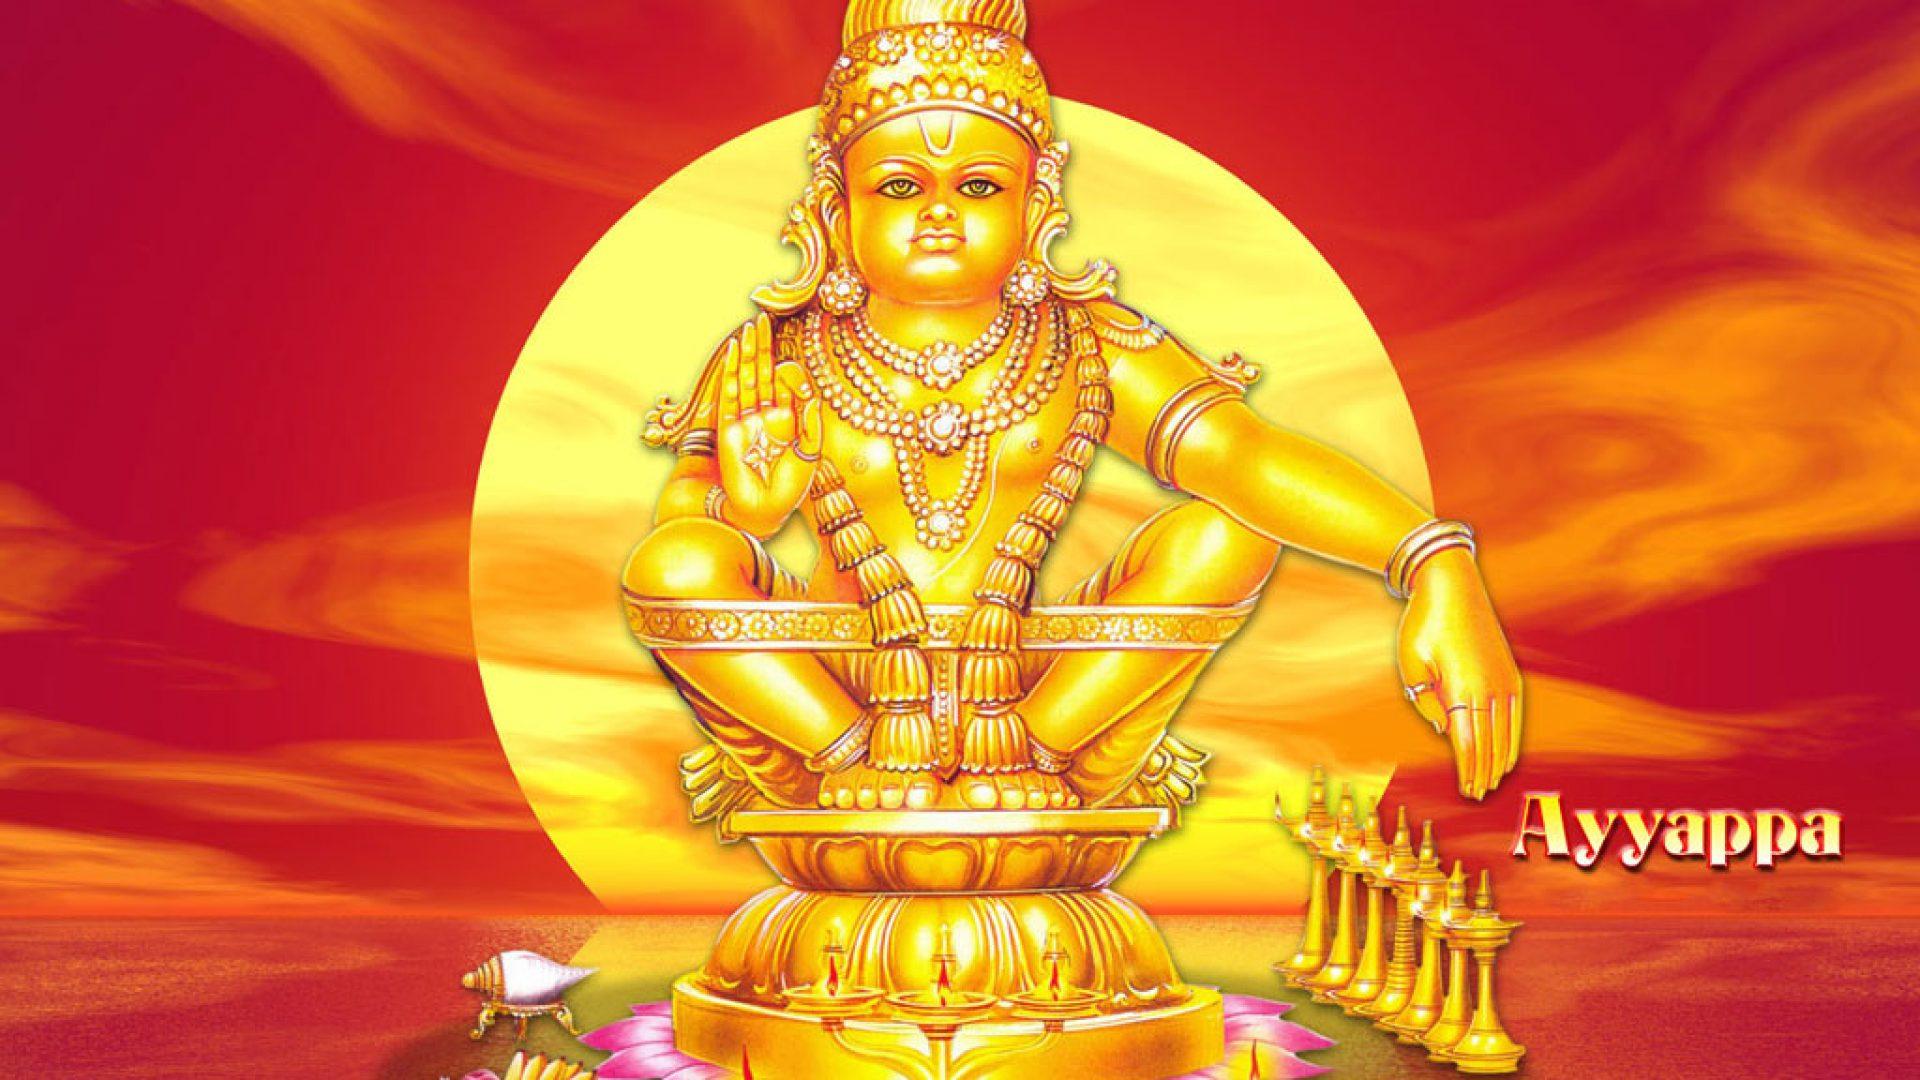 Ayyappa Wallpaper 1080p